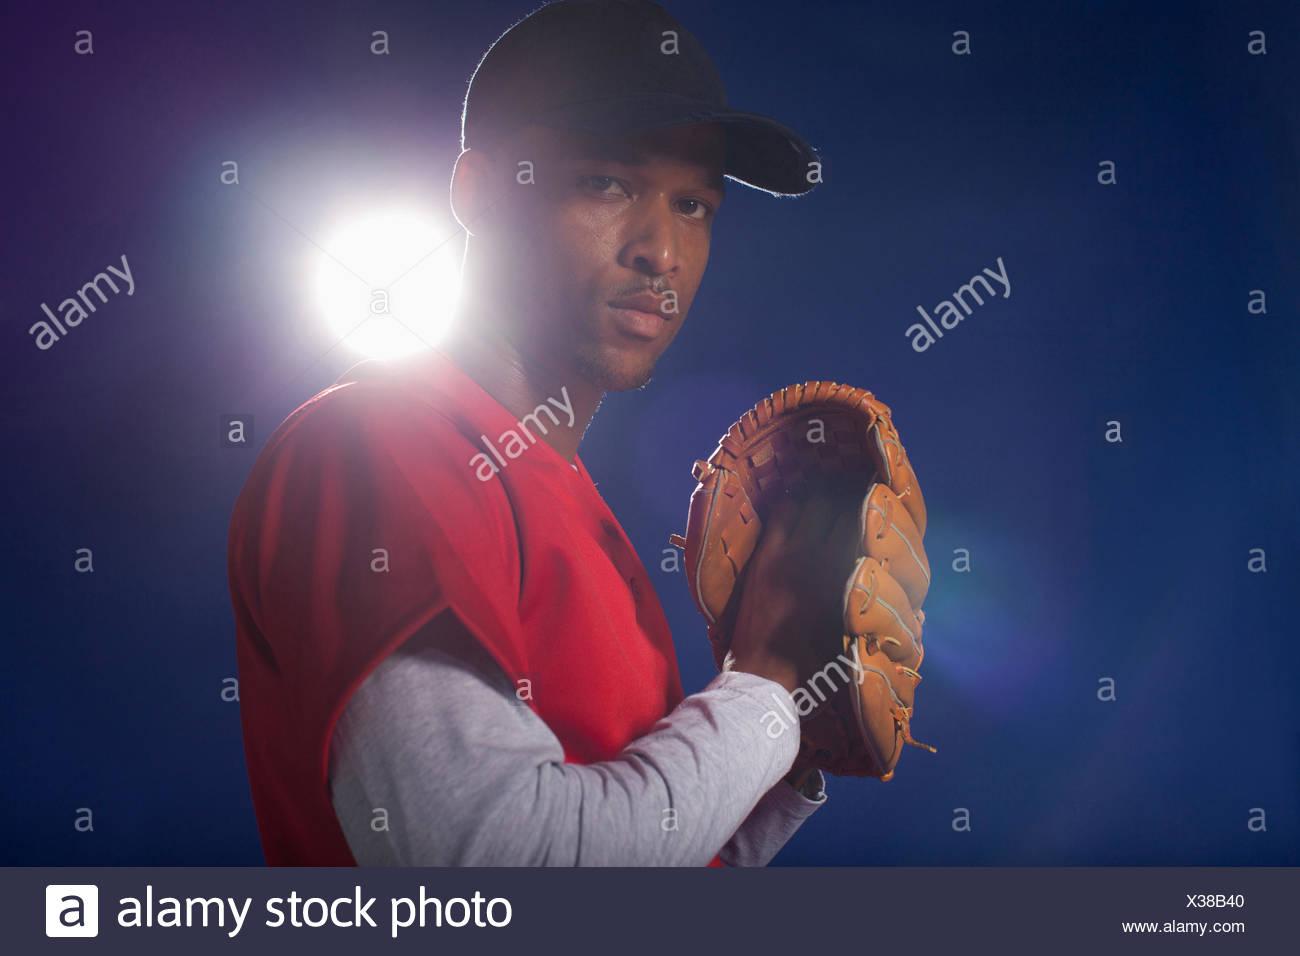 Baseball player holding glove - Stock Image